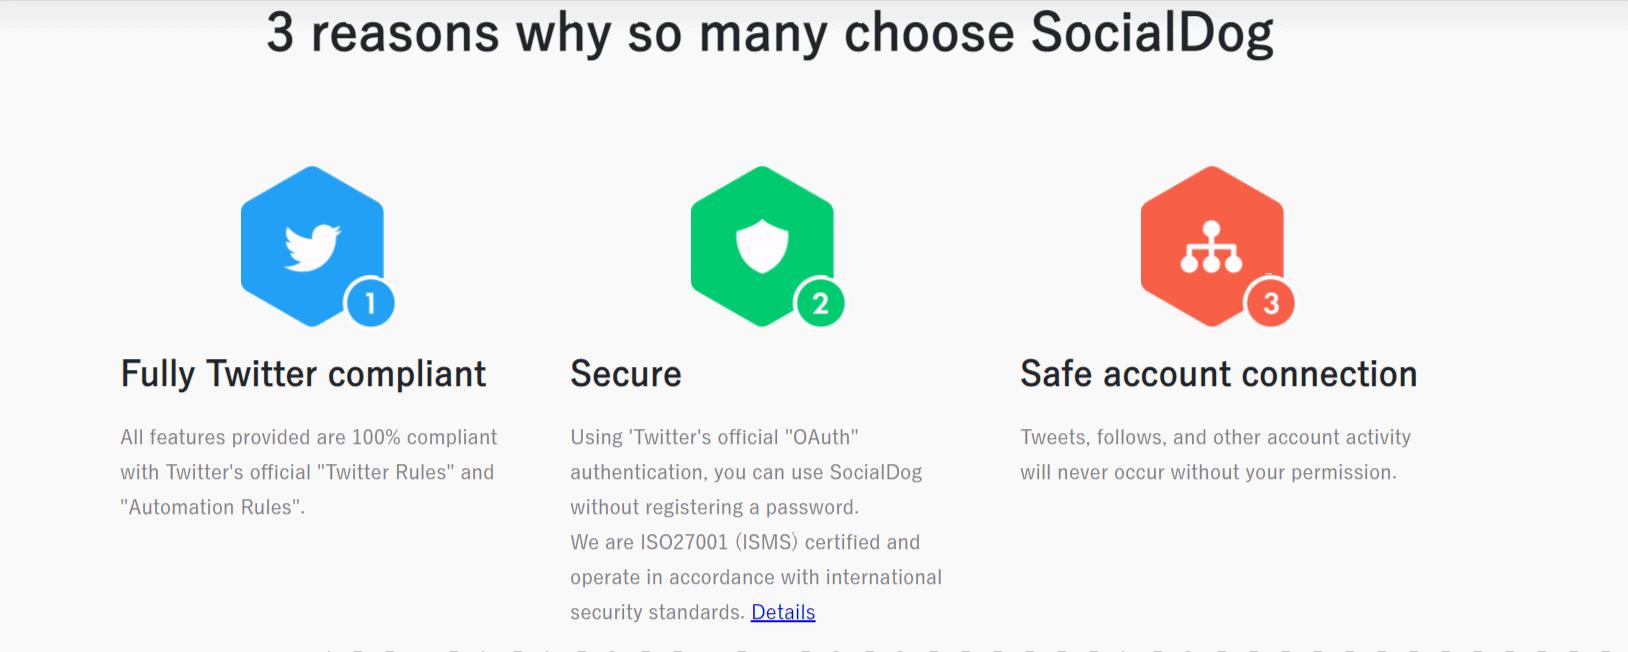 Reasons to choose SocialDog